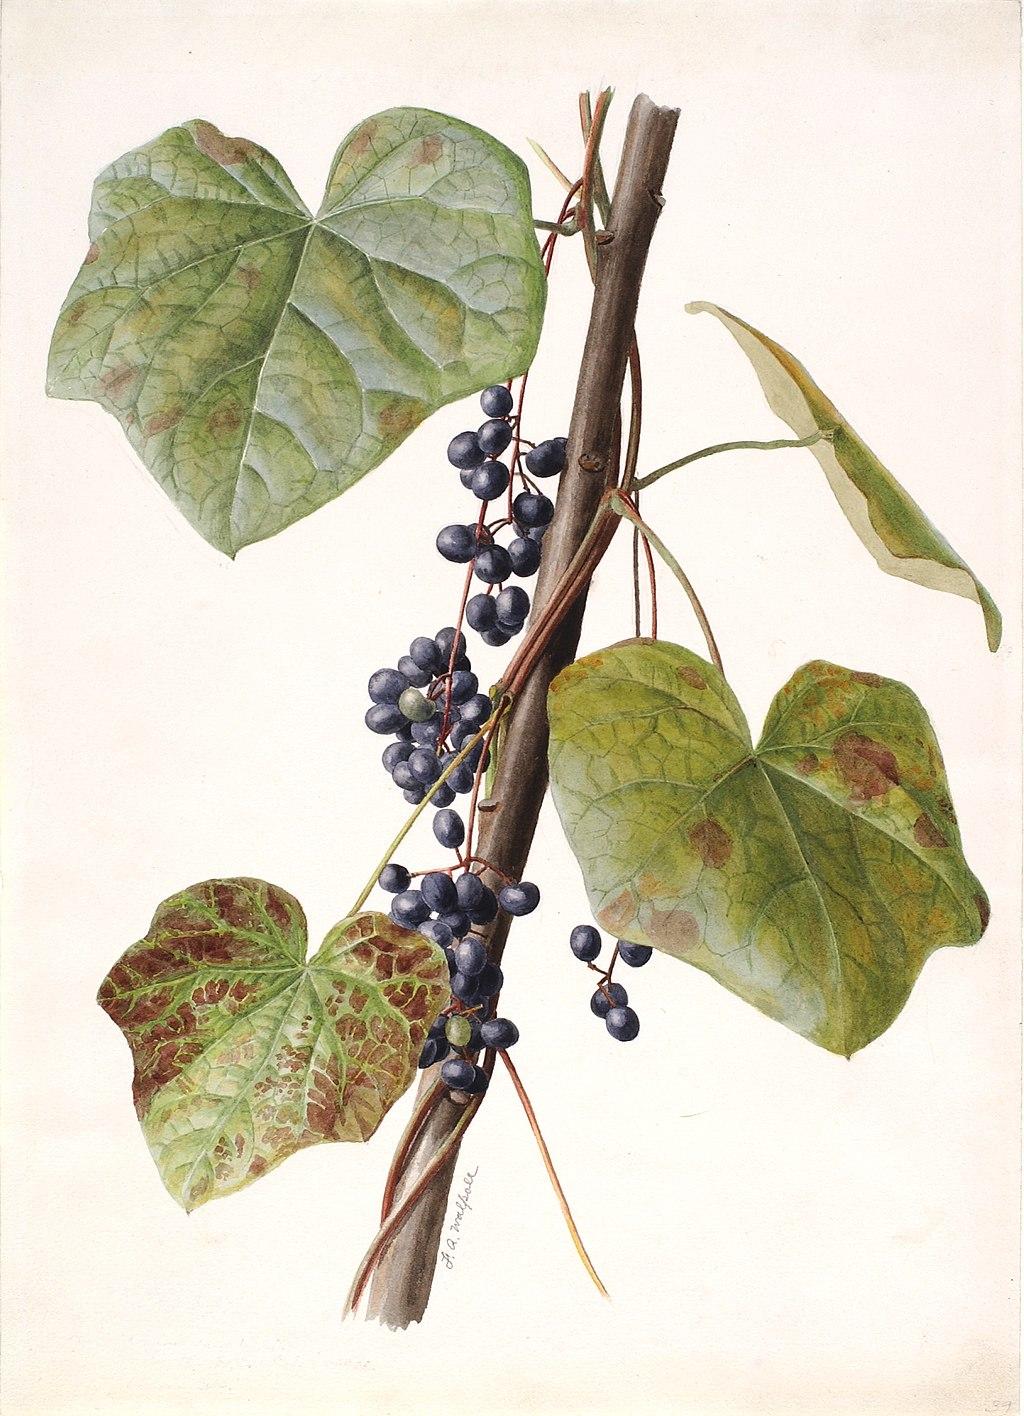 Canadian Moonseed Menispermum canadense